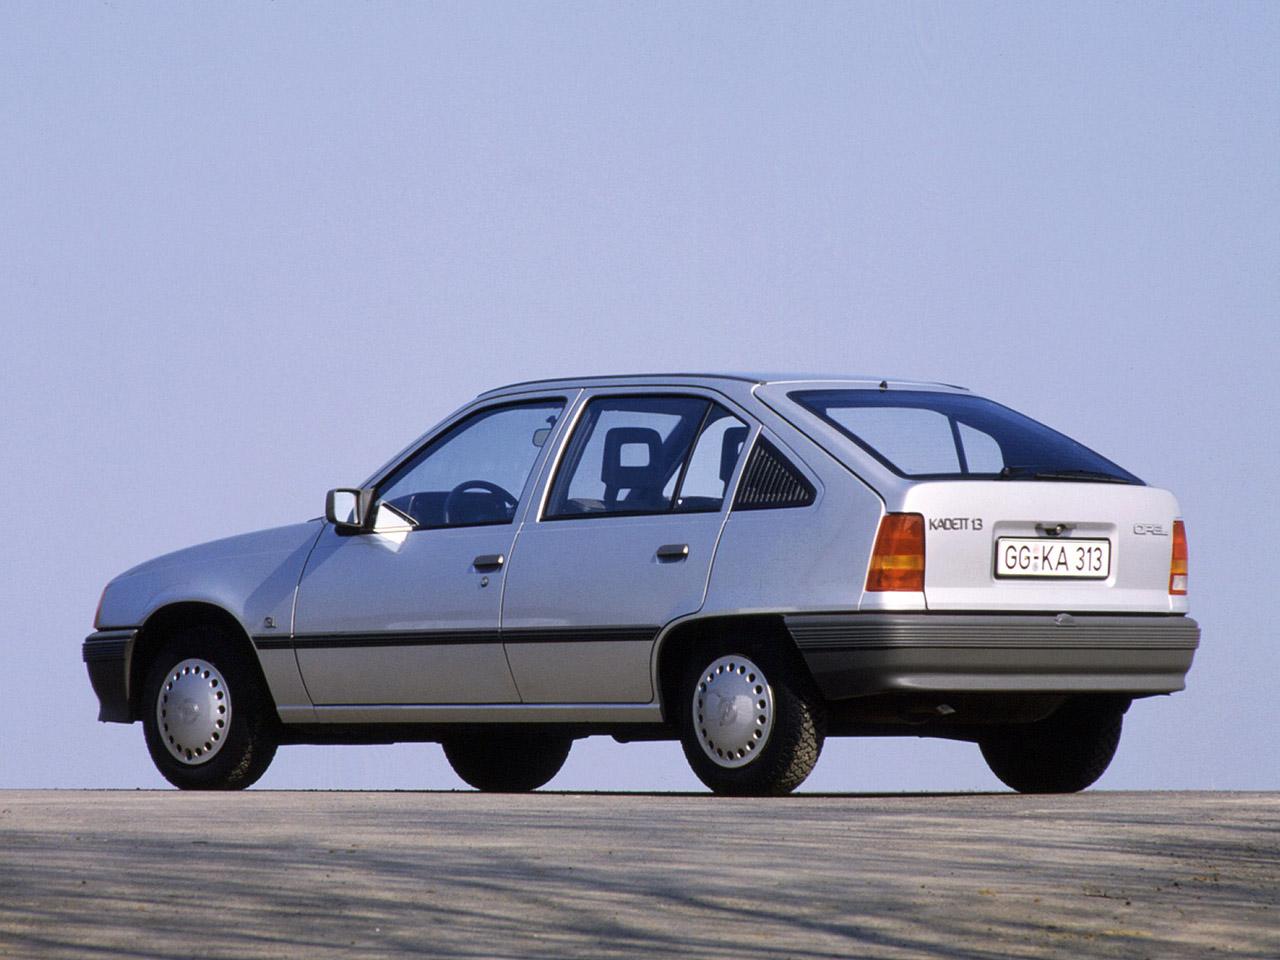 Opel Kadett E Restyling 1989 - 1993 Hatchback 5 door #4